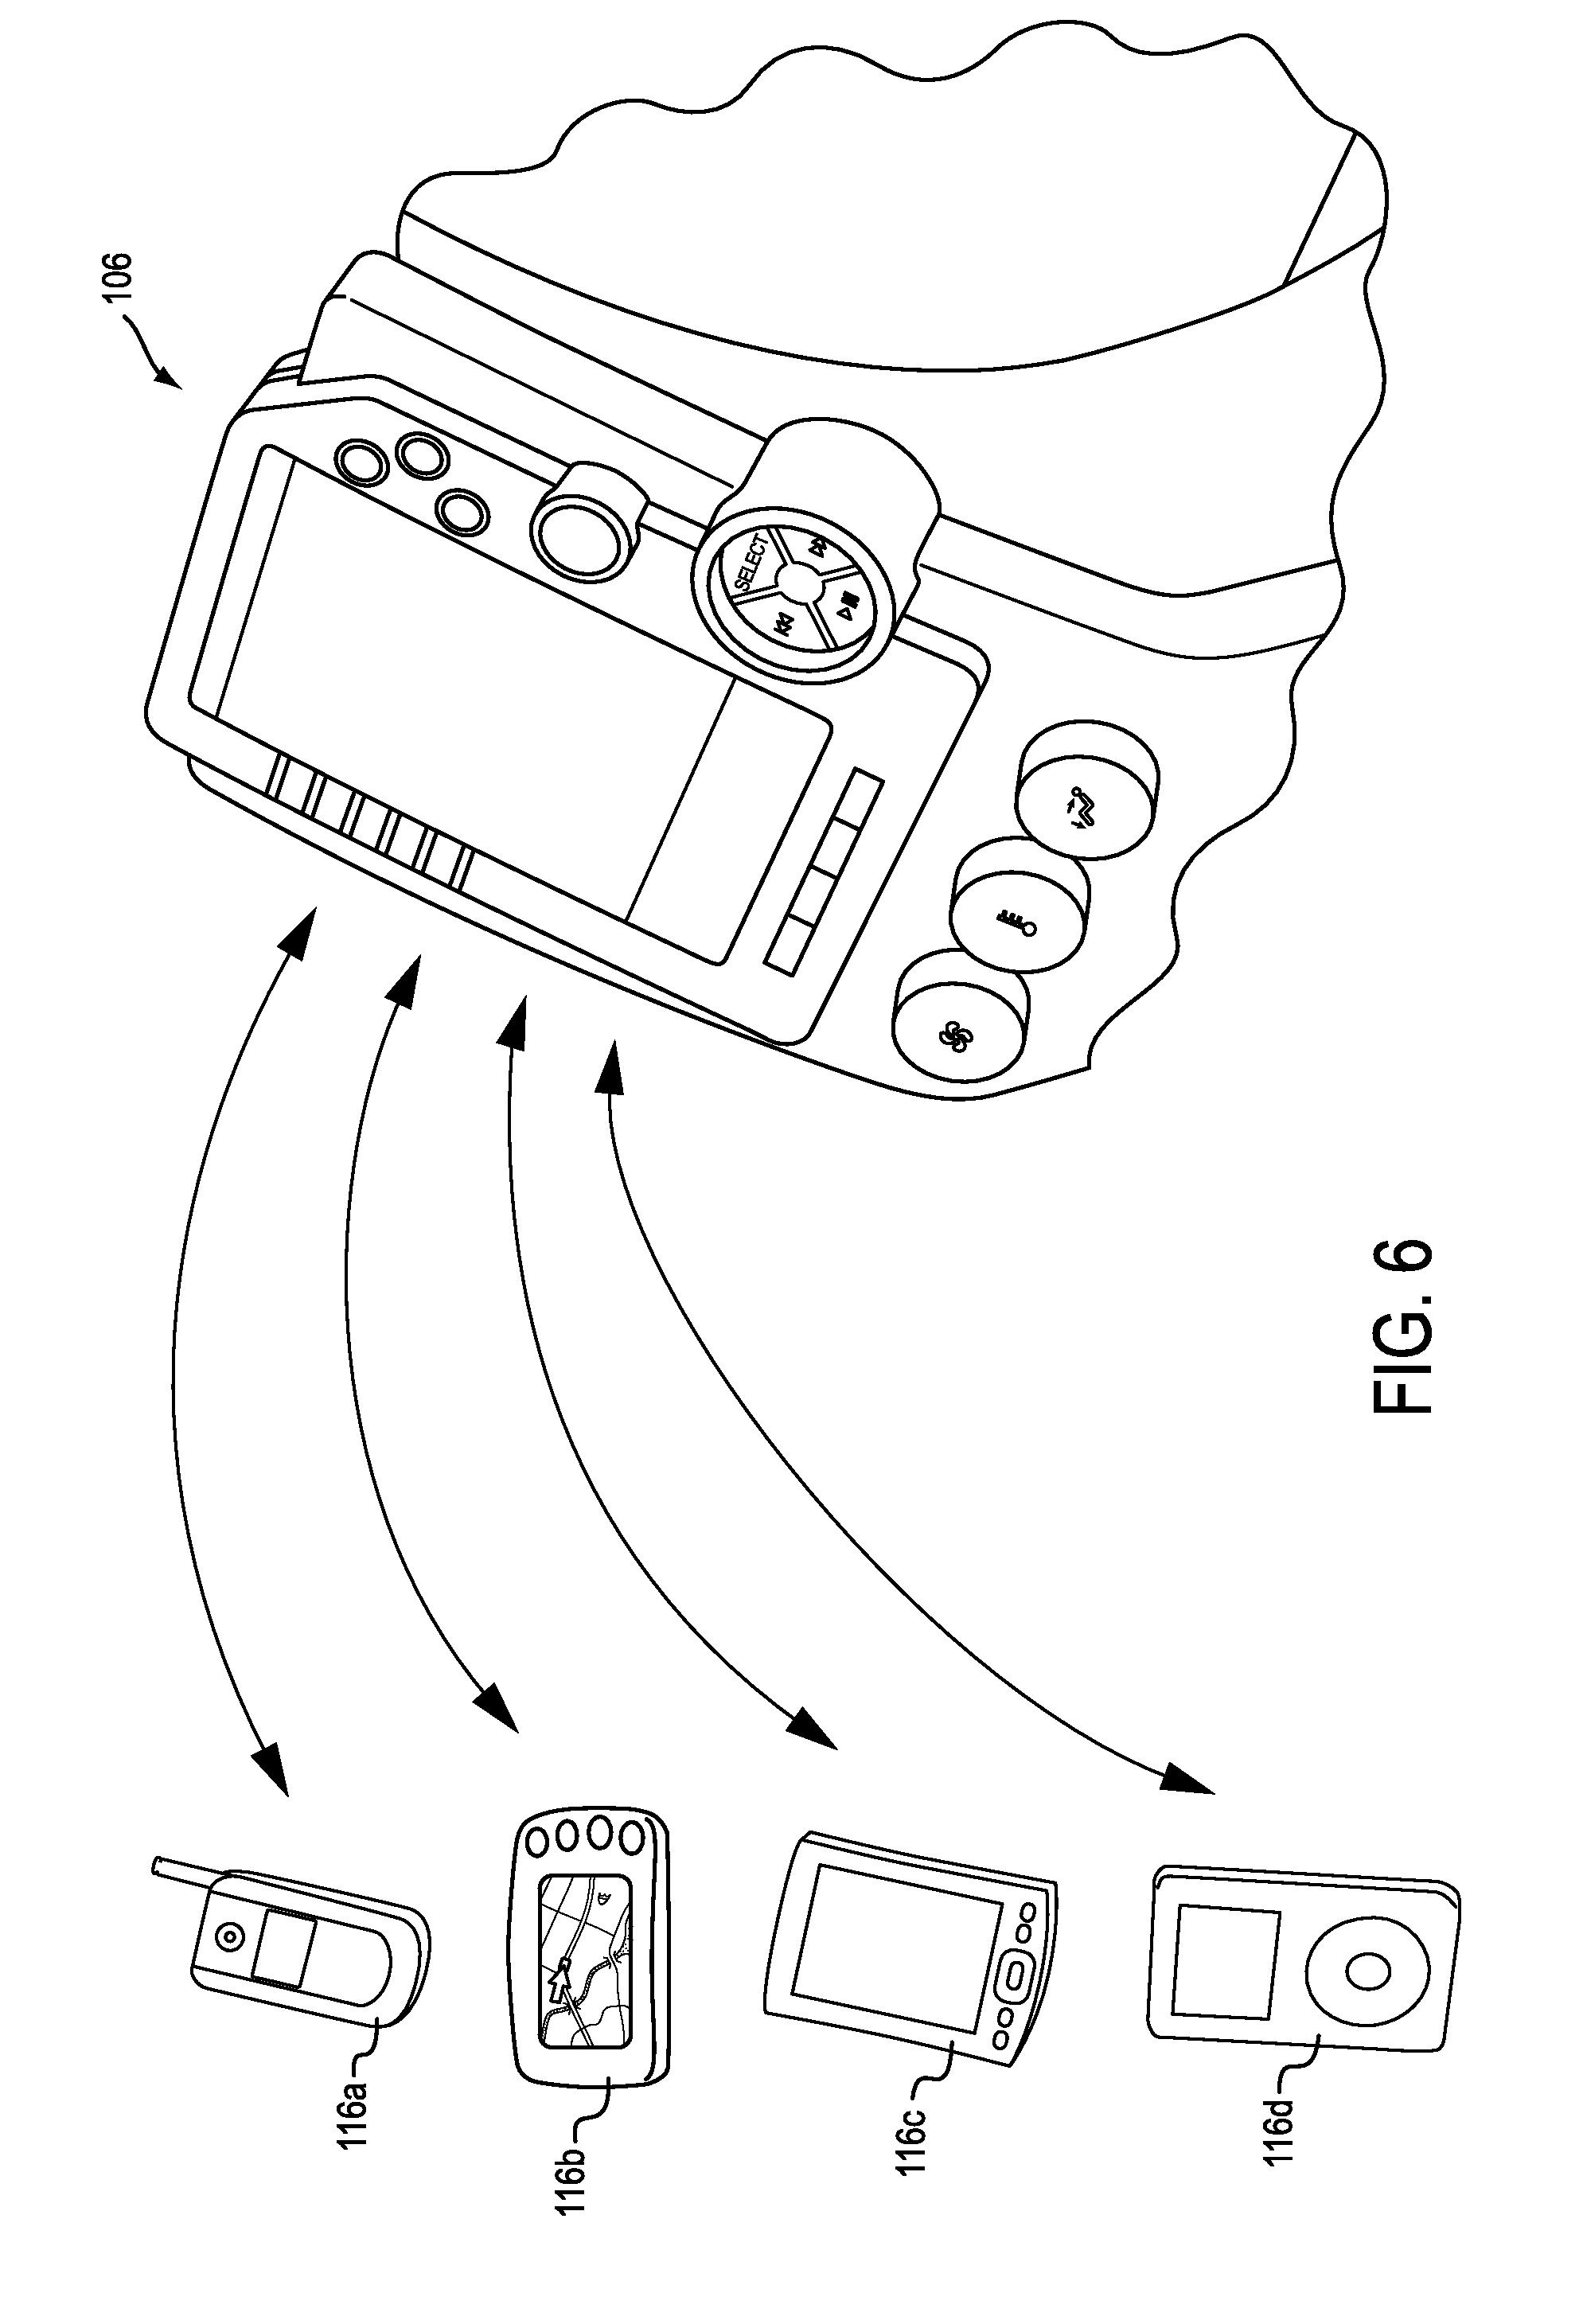 auto gauge wiring diagram tachometer images wire tachometer diagram auto meter wiring 2005 3688 gauge tachometer